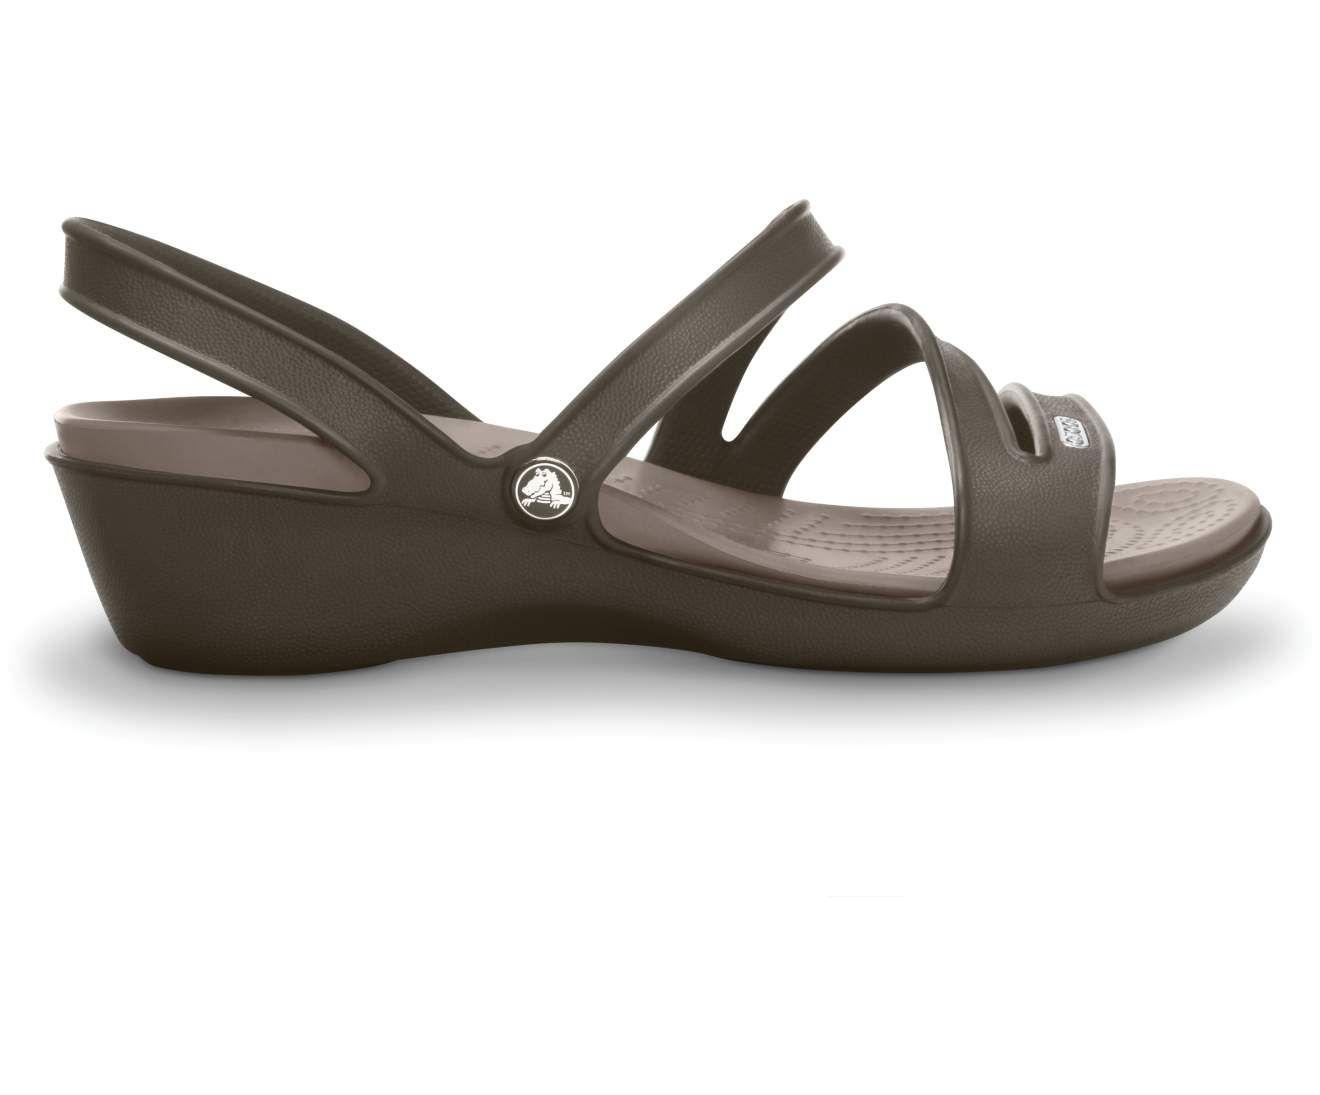 8a7e67c7e Crocs™ Patricia Wedge Sandal